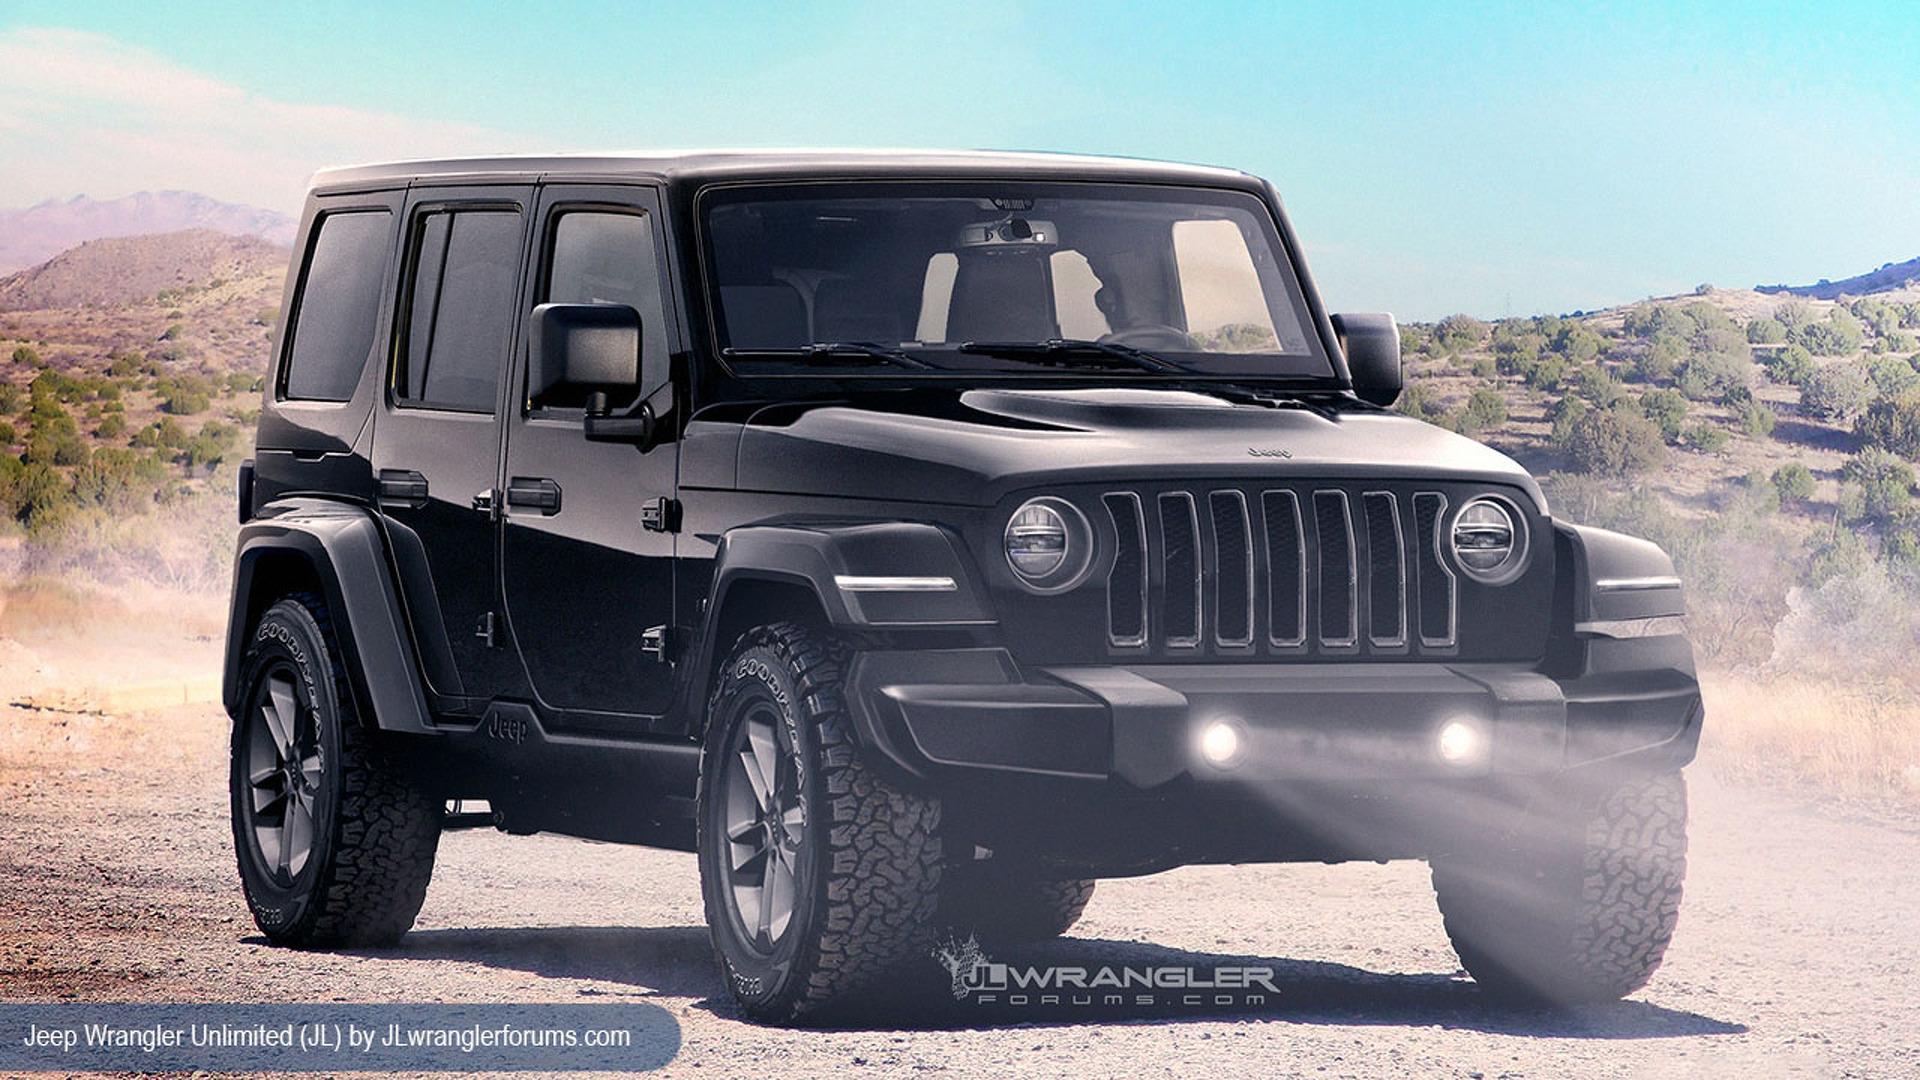 Next-gen Jeep Wrangler production to begin in November